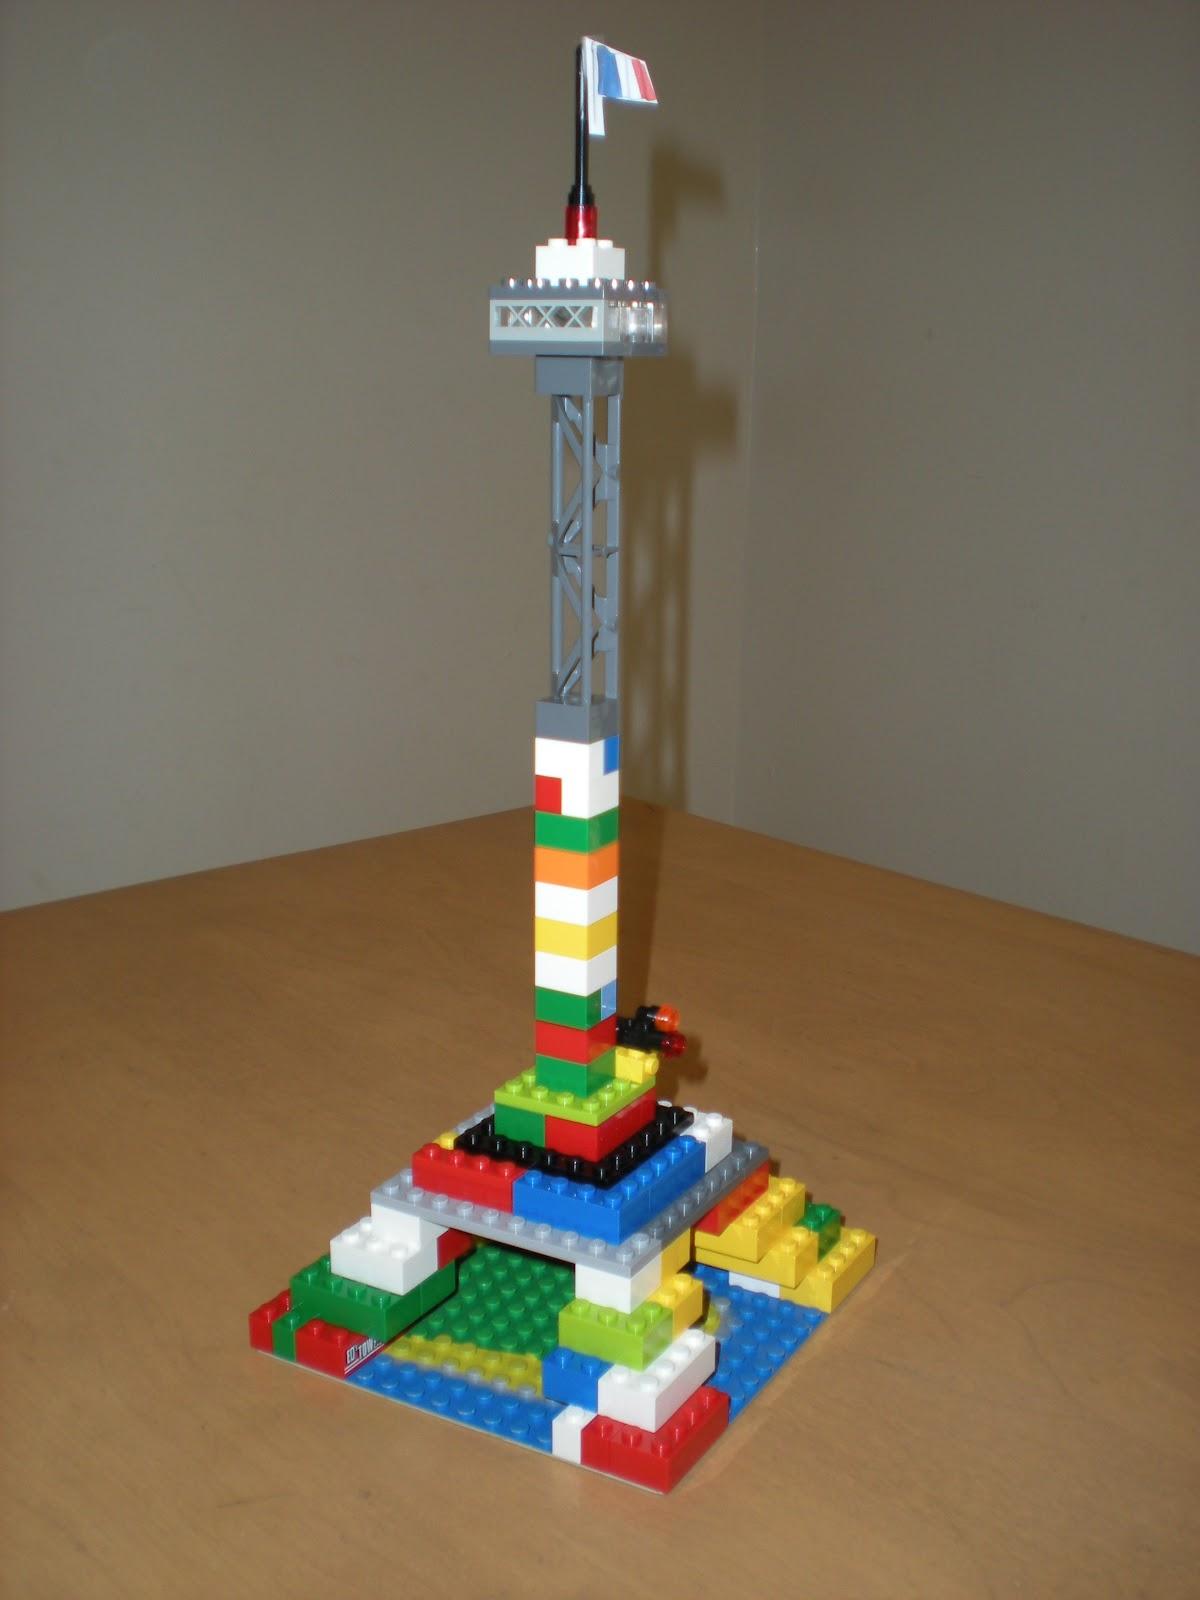 Ice Cream Elementary School Lego ThursdayMadelineParis